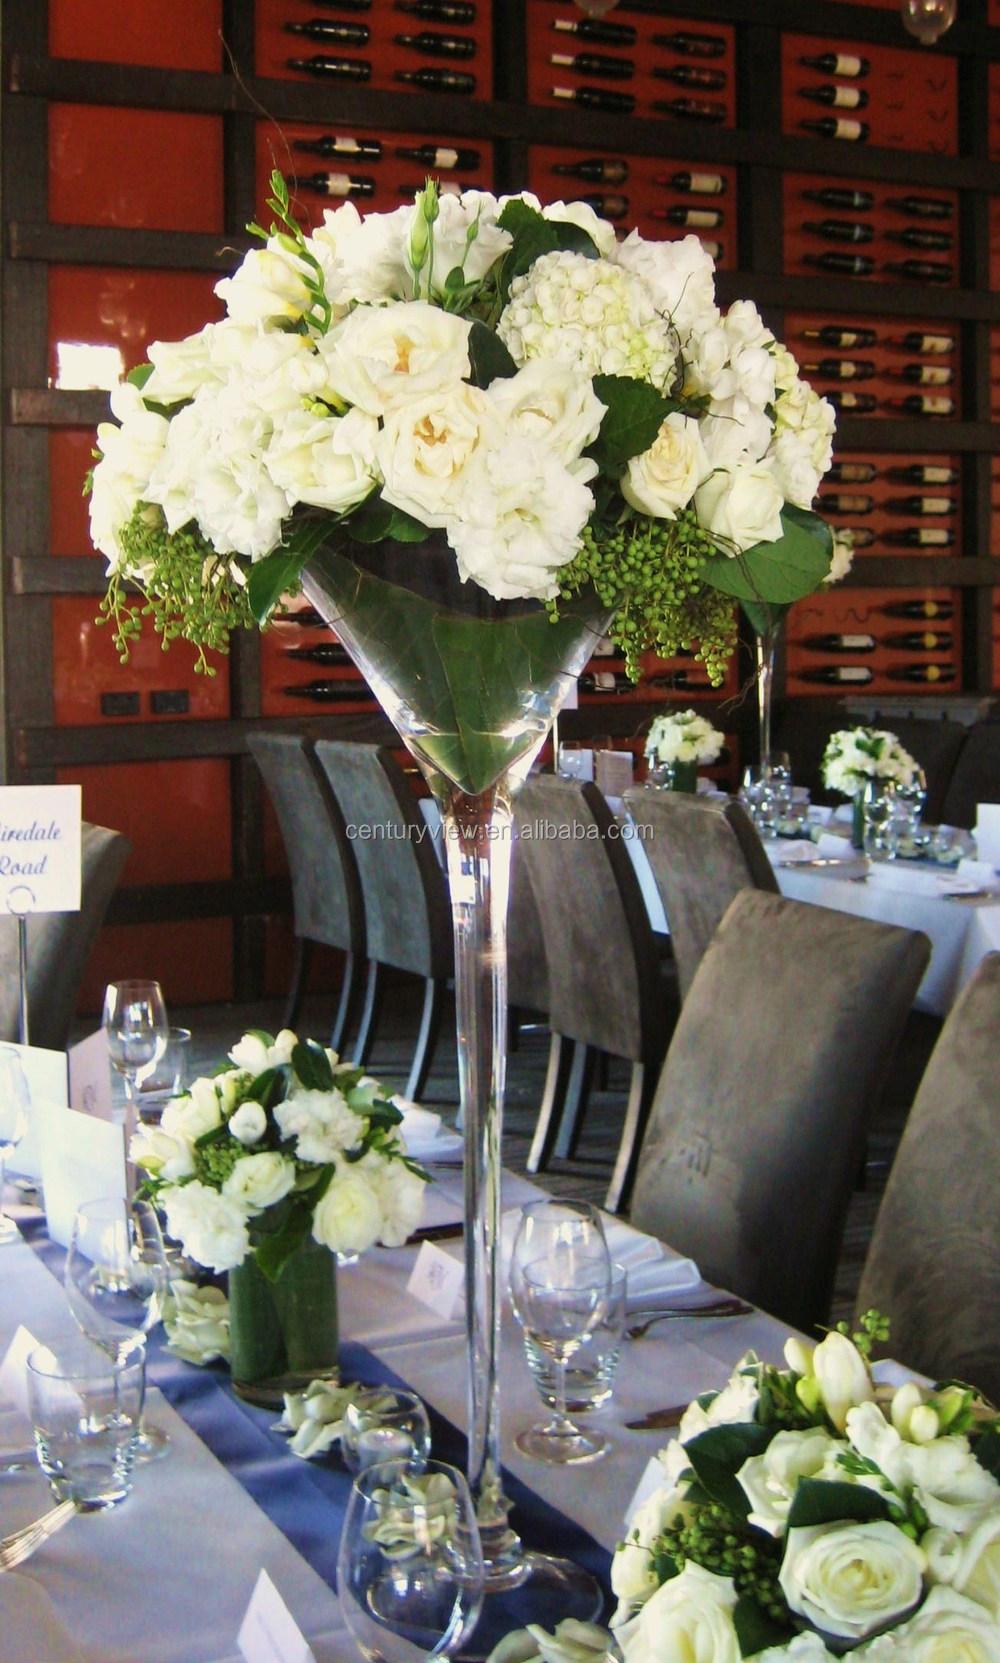 Long stemmed wholesale martini glass vases wedding